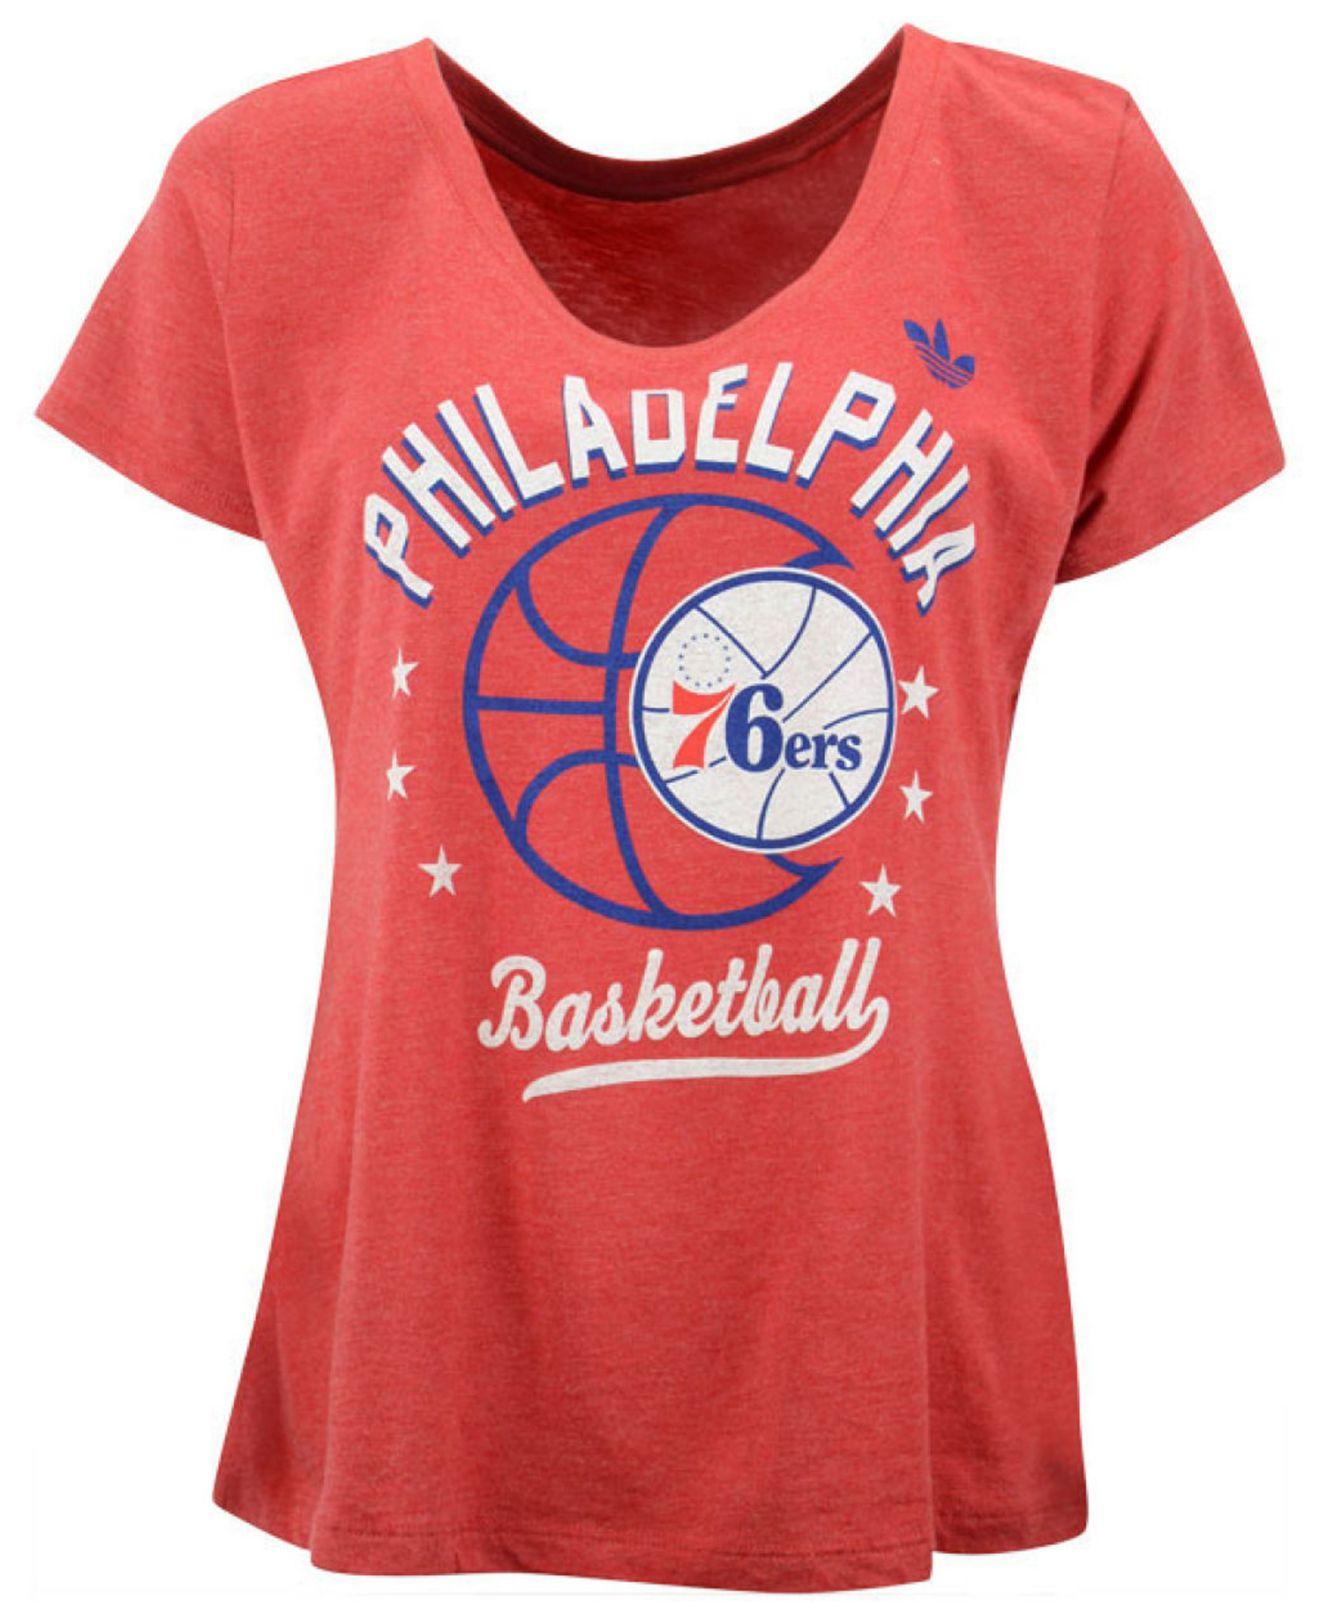 Lyst - Adidas Originals Women s Philadelphia 76ers Basketball Scoop ... e7641ddbd